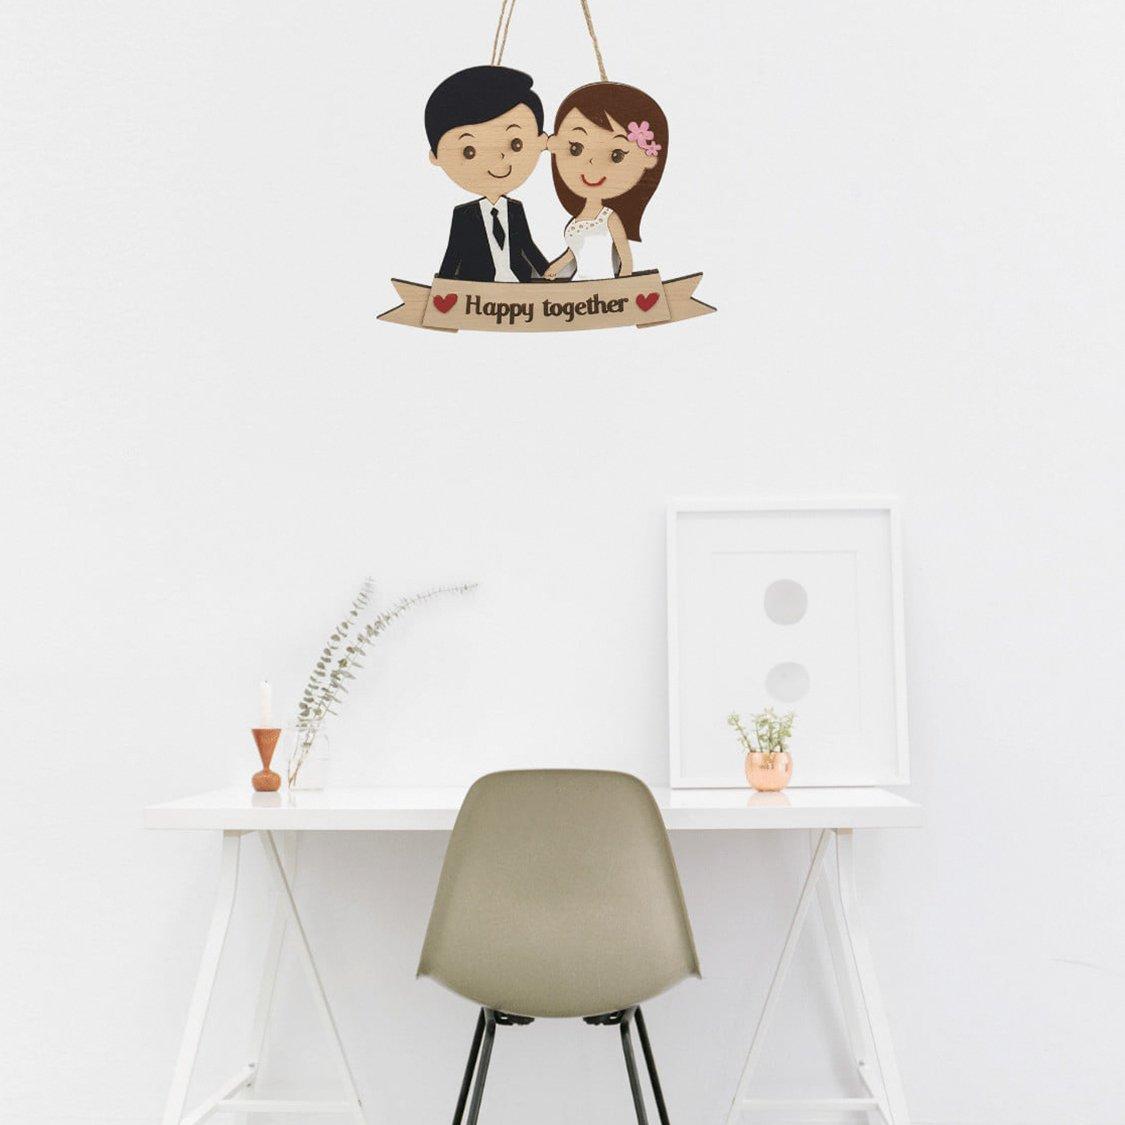 Bảng gỗ handmade trang trí Happy Together